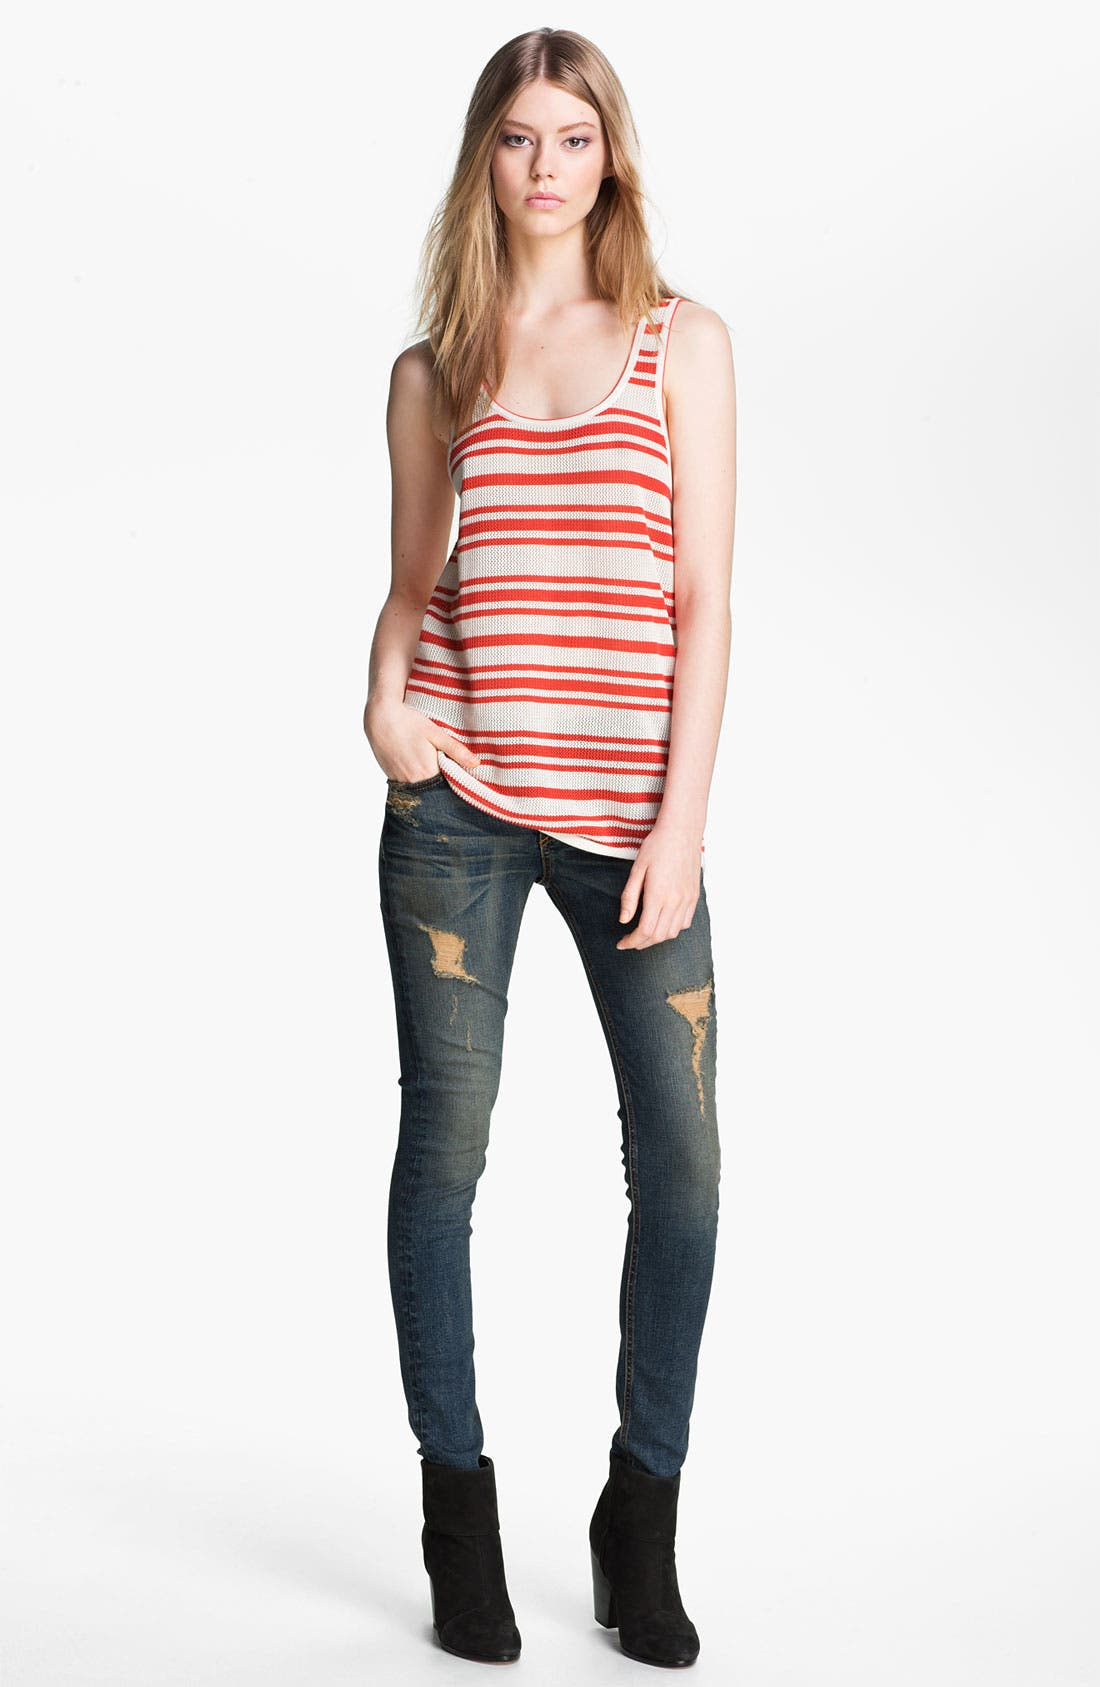 Main Image - rag & bone/JEAN 'Kathie' Stripe Tank